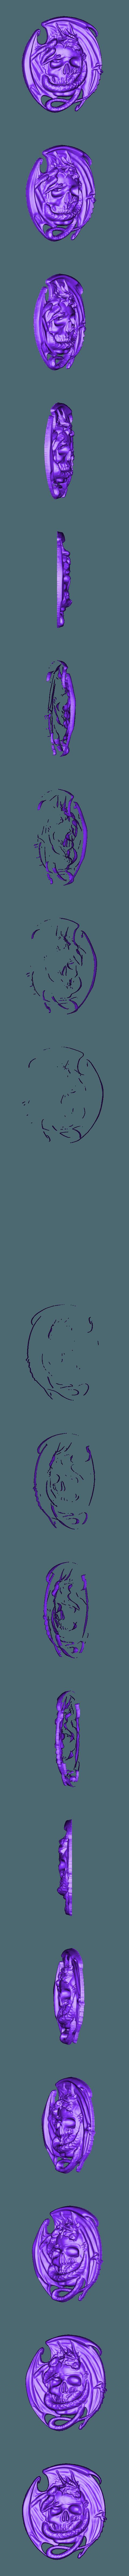 291.stl Download free STL file Skull with dragon cnc router art  • 3D printing model, Terhrinai